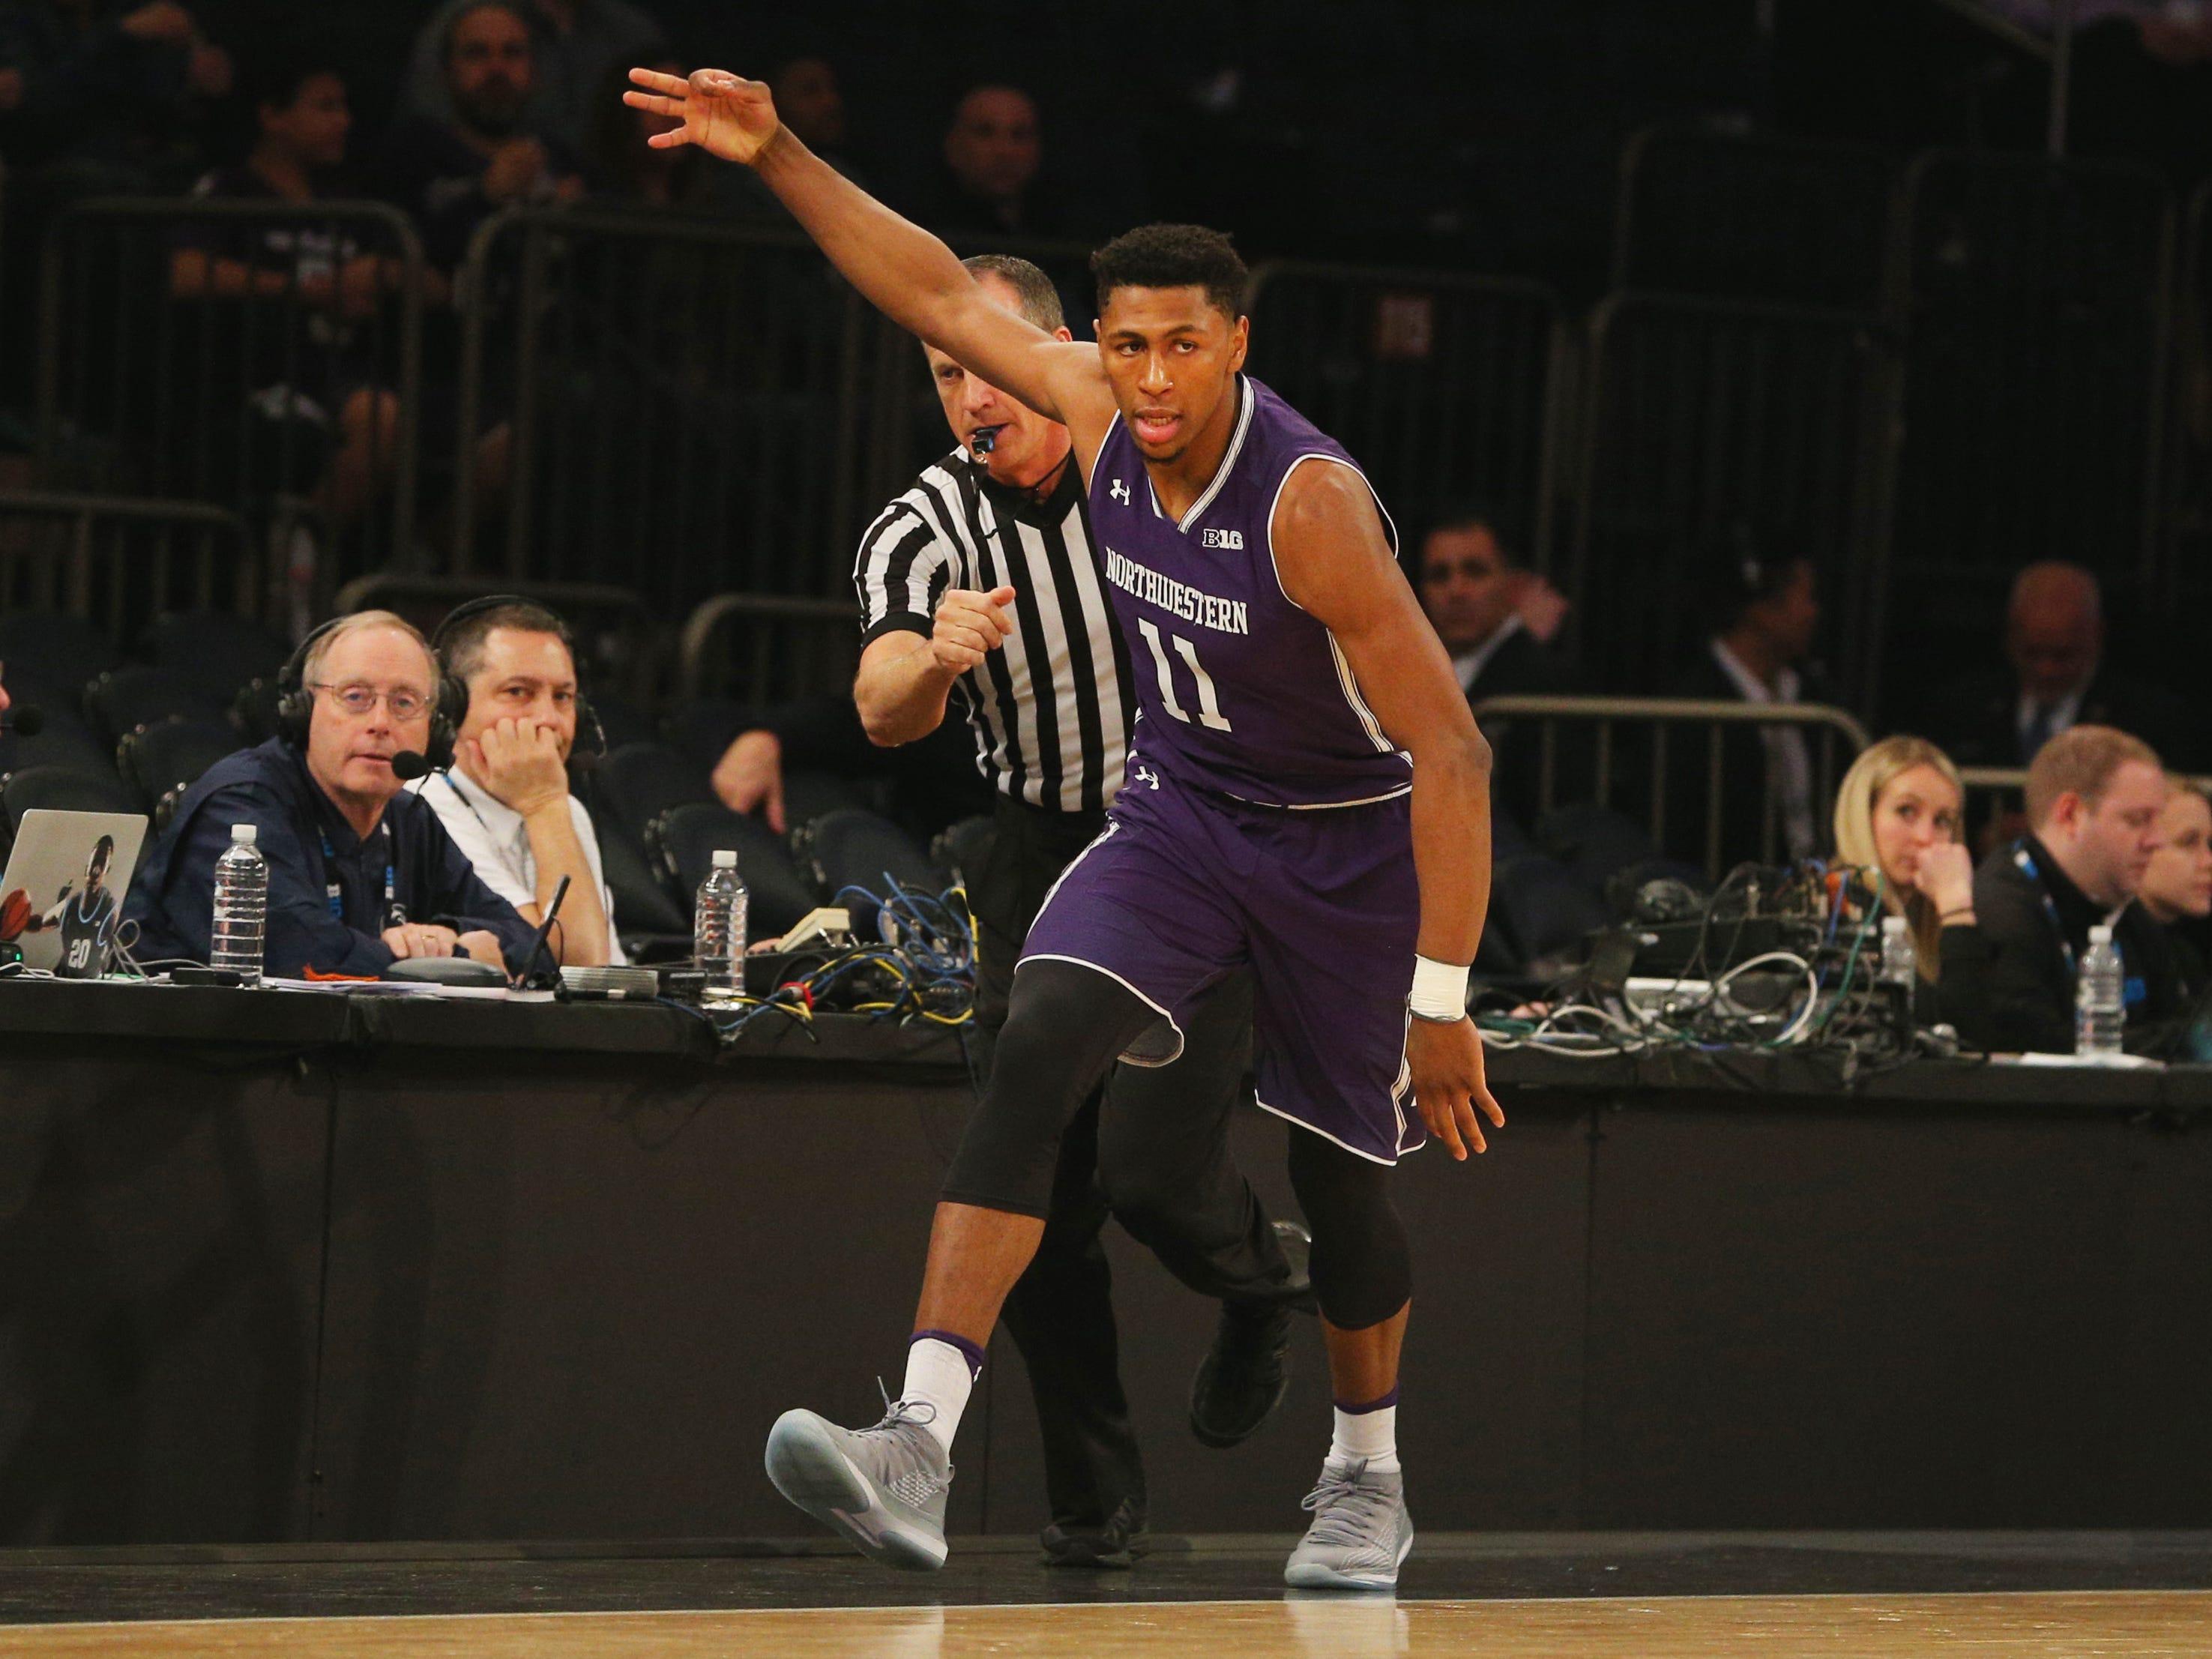 12. Northwestern | 2017-18 record: 15-17 | Big Ten record: 6-12